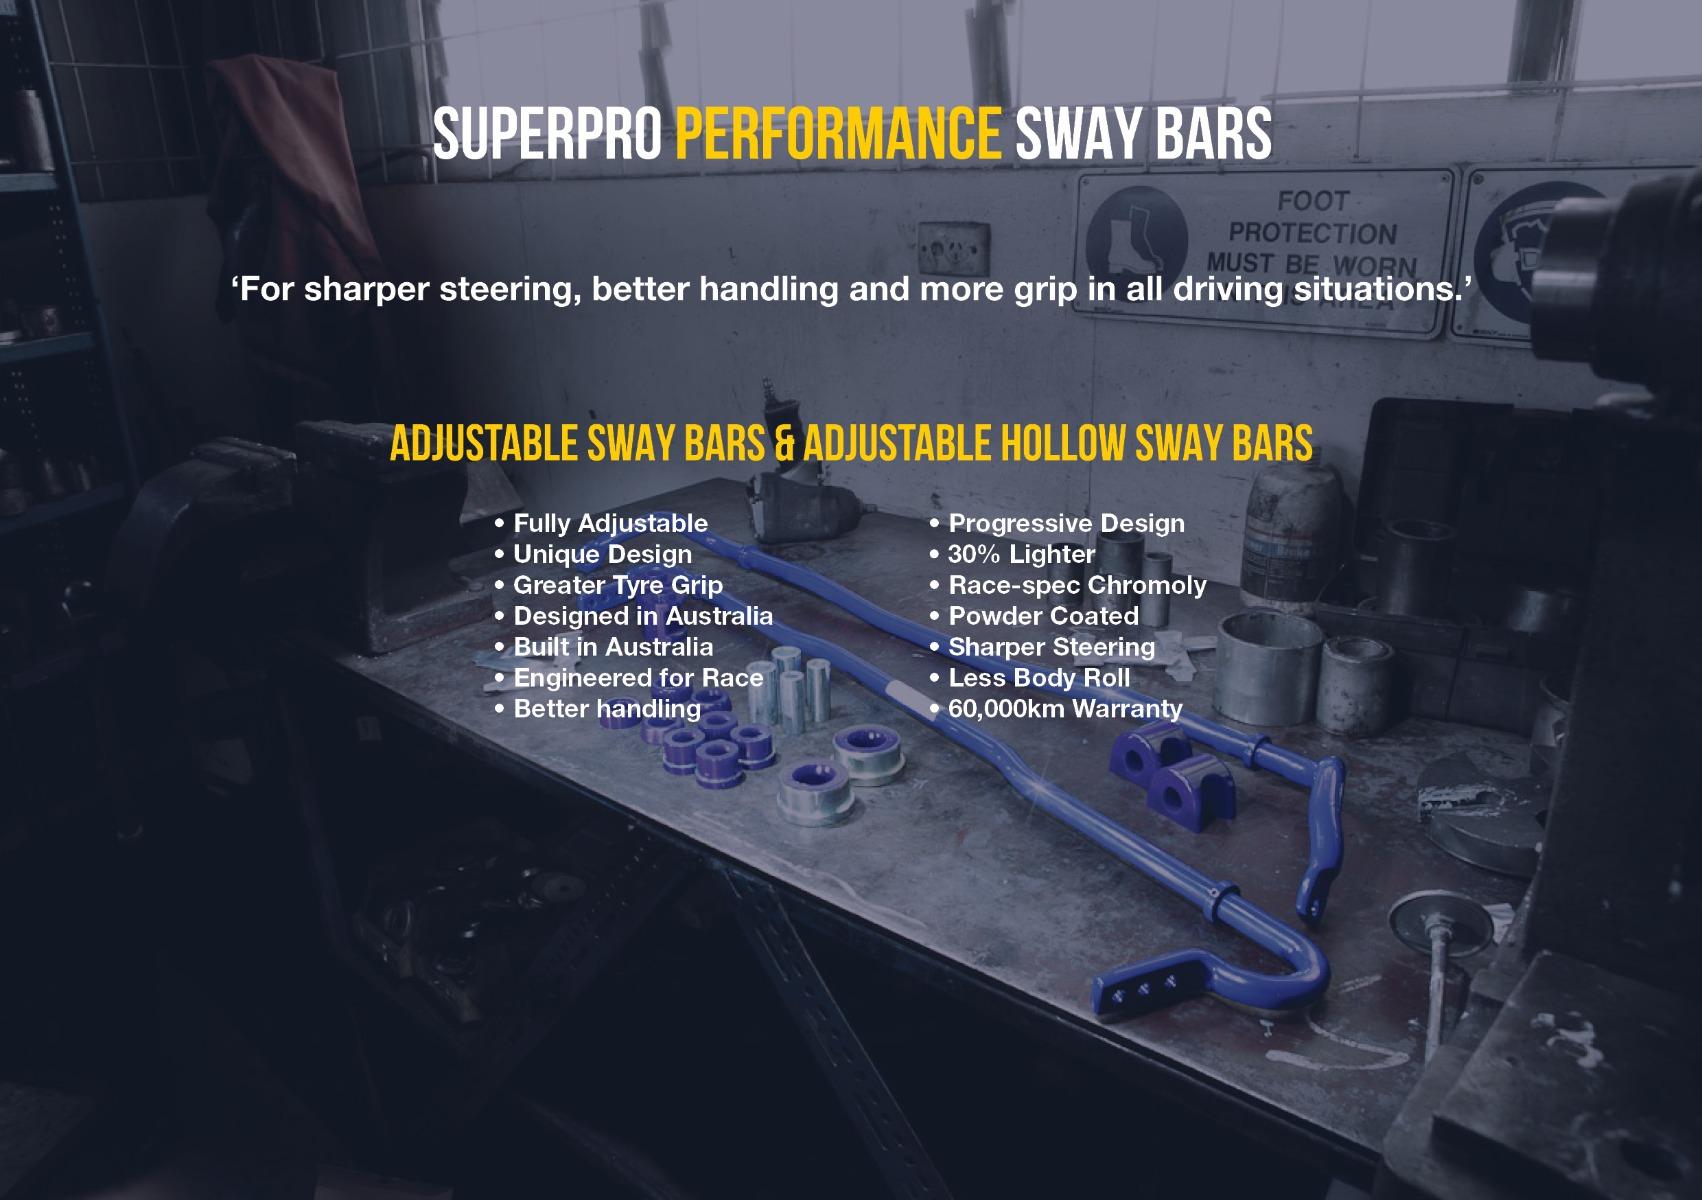 Fulcrum suspensions sells complete superpro sway bar kits